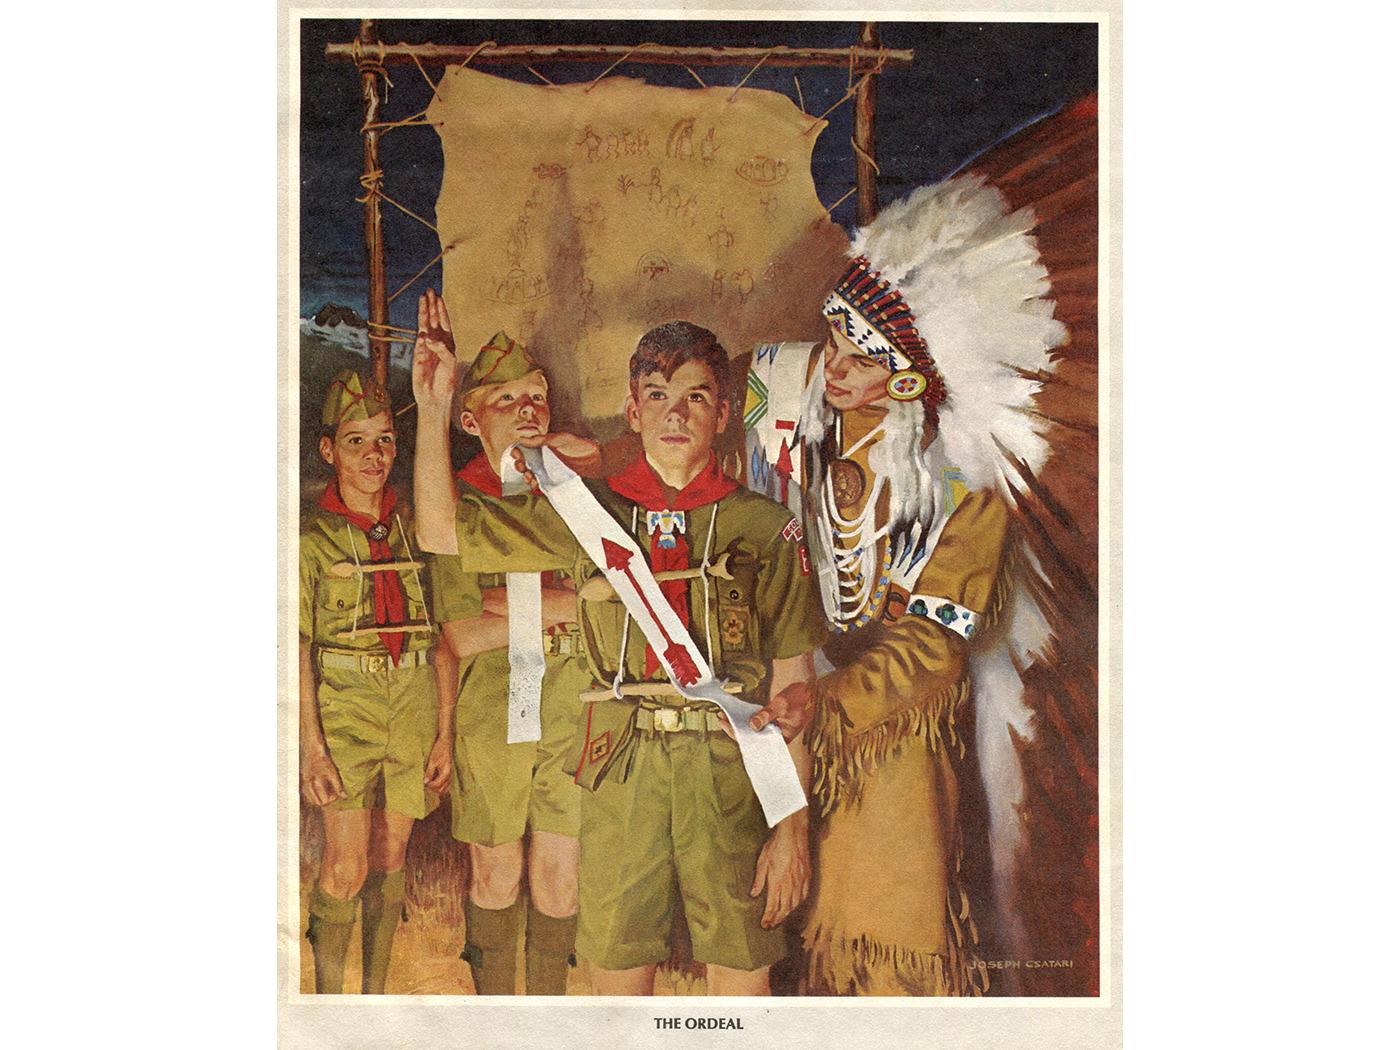 boyscout_order_of_the_arrow.jpg